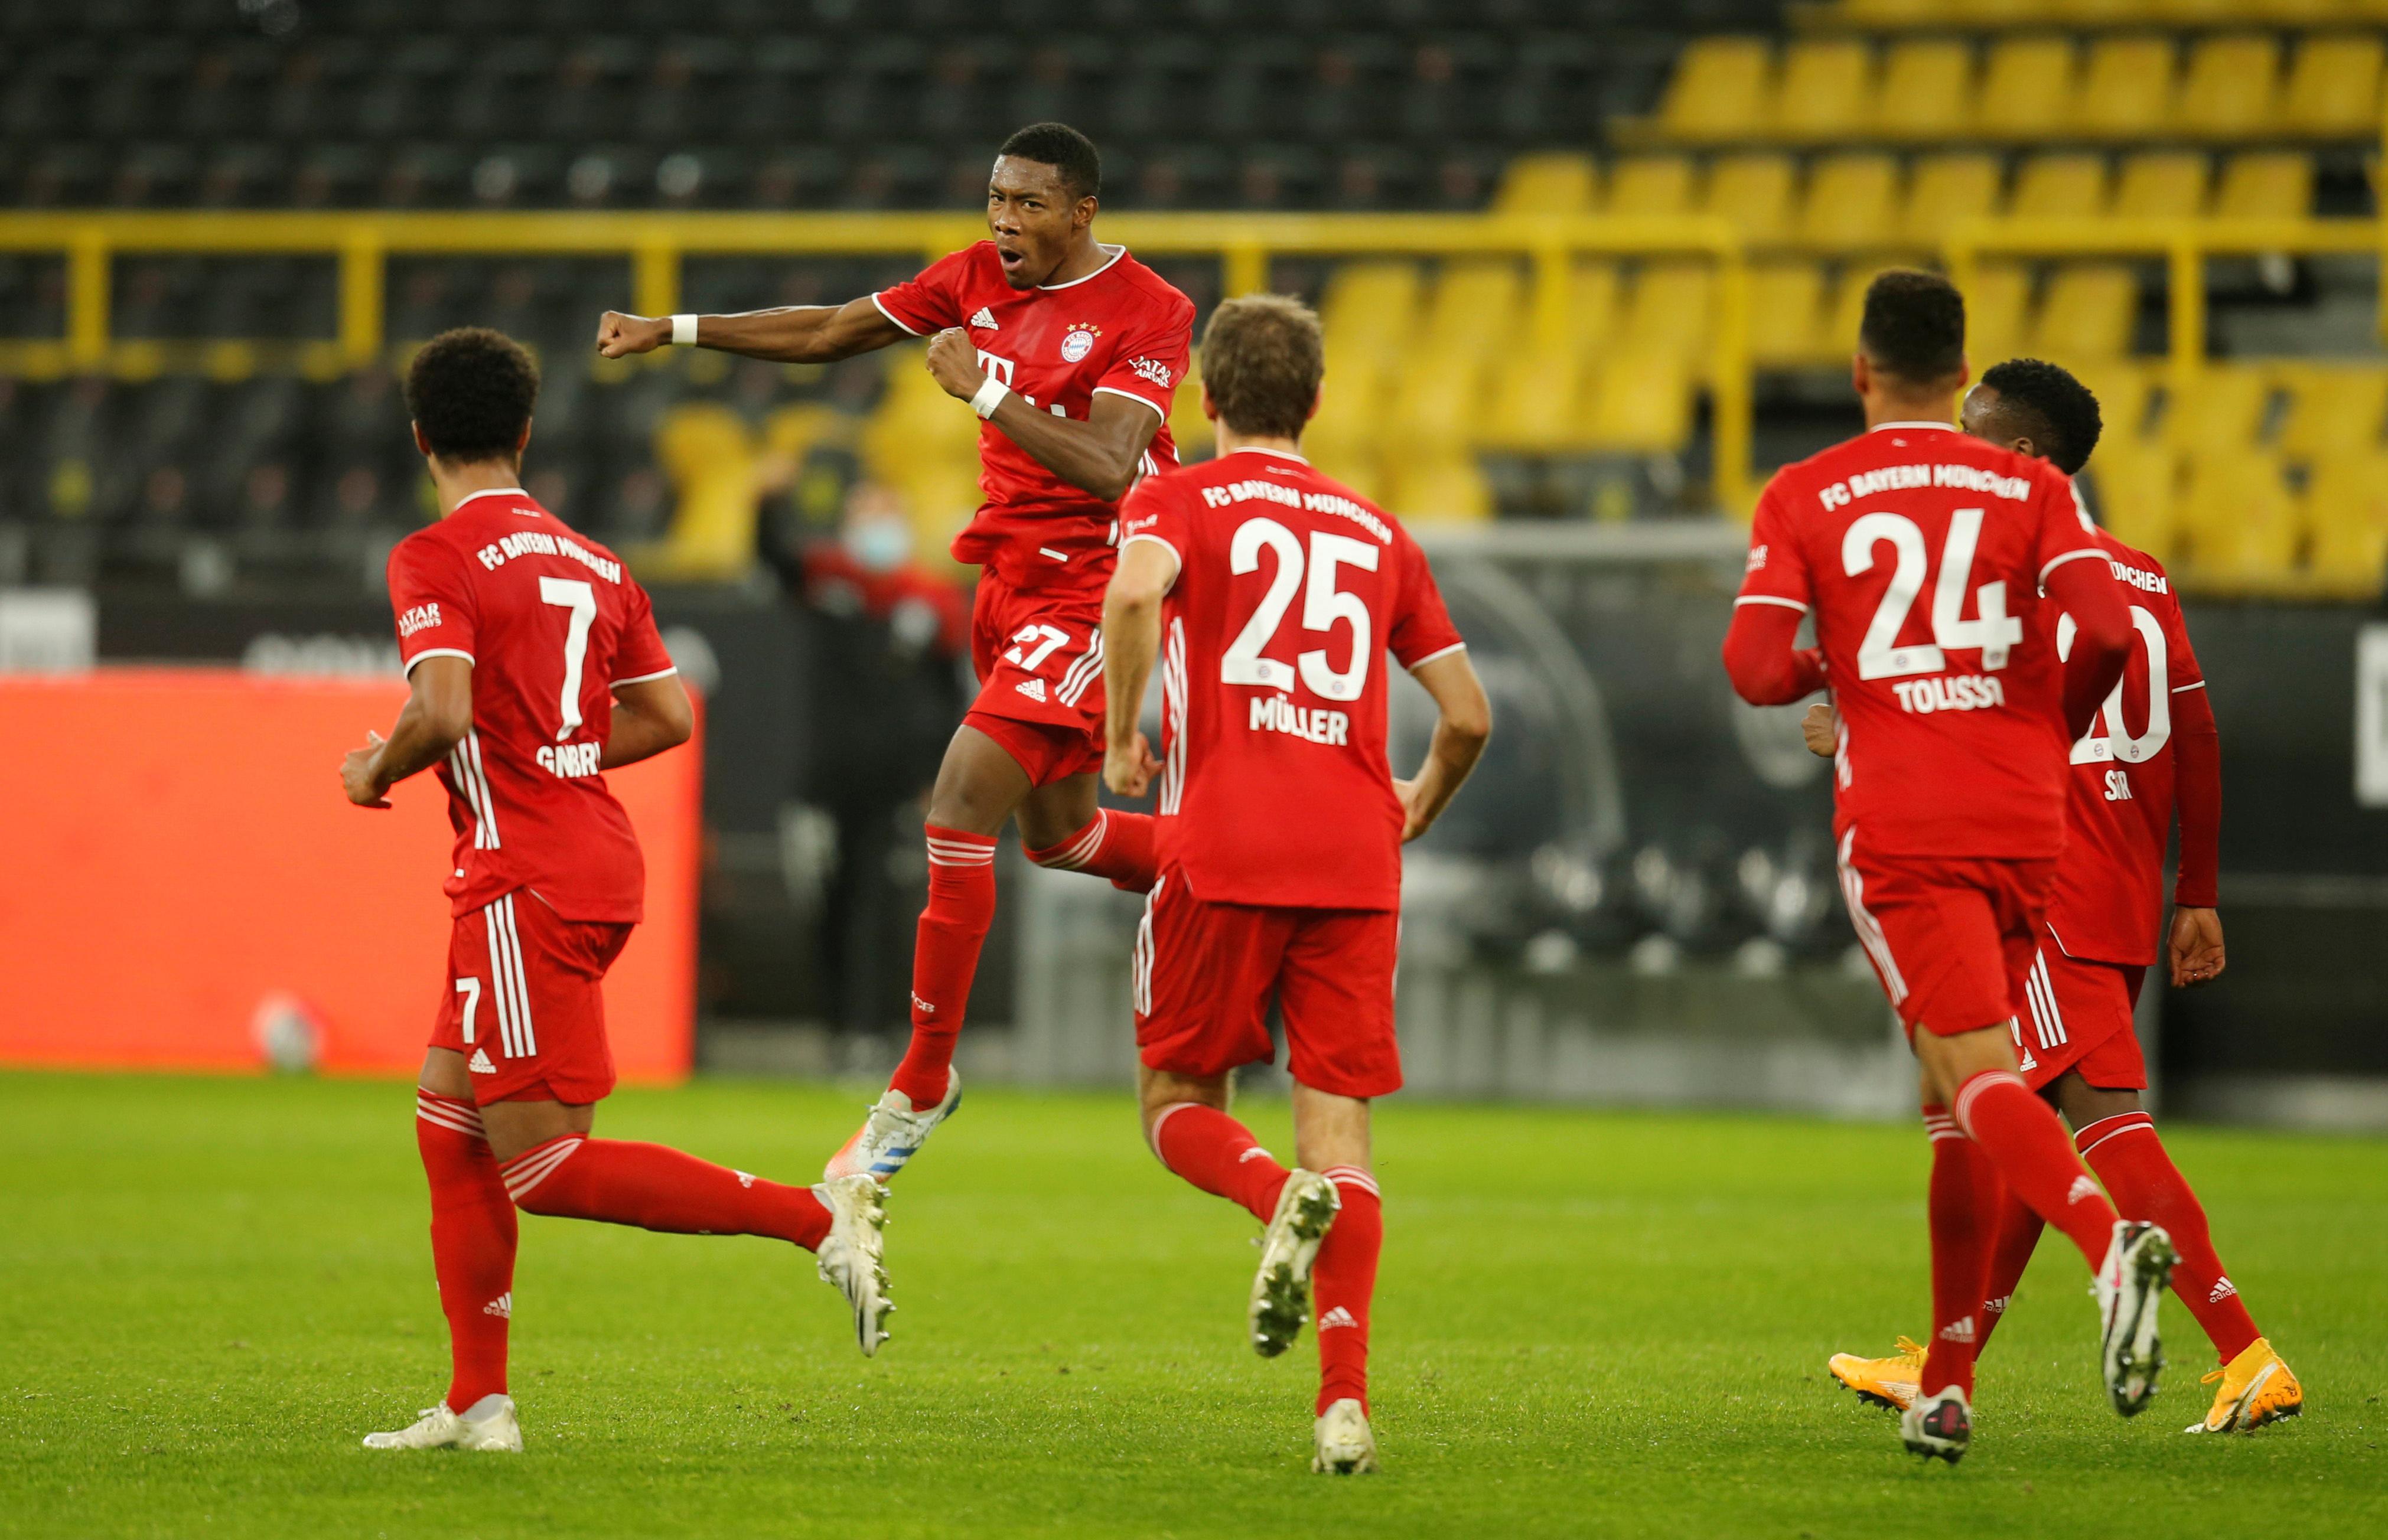 Bayern's German Cup match postponed to next year – joluu